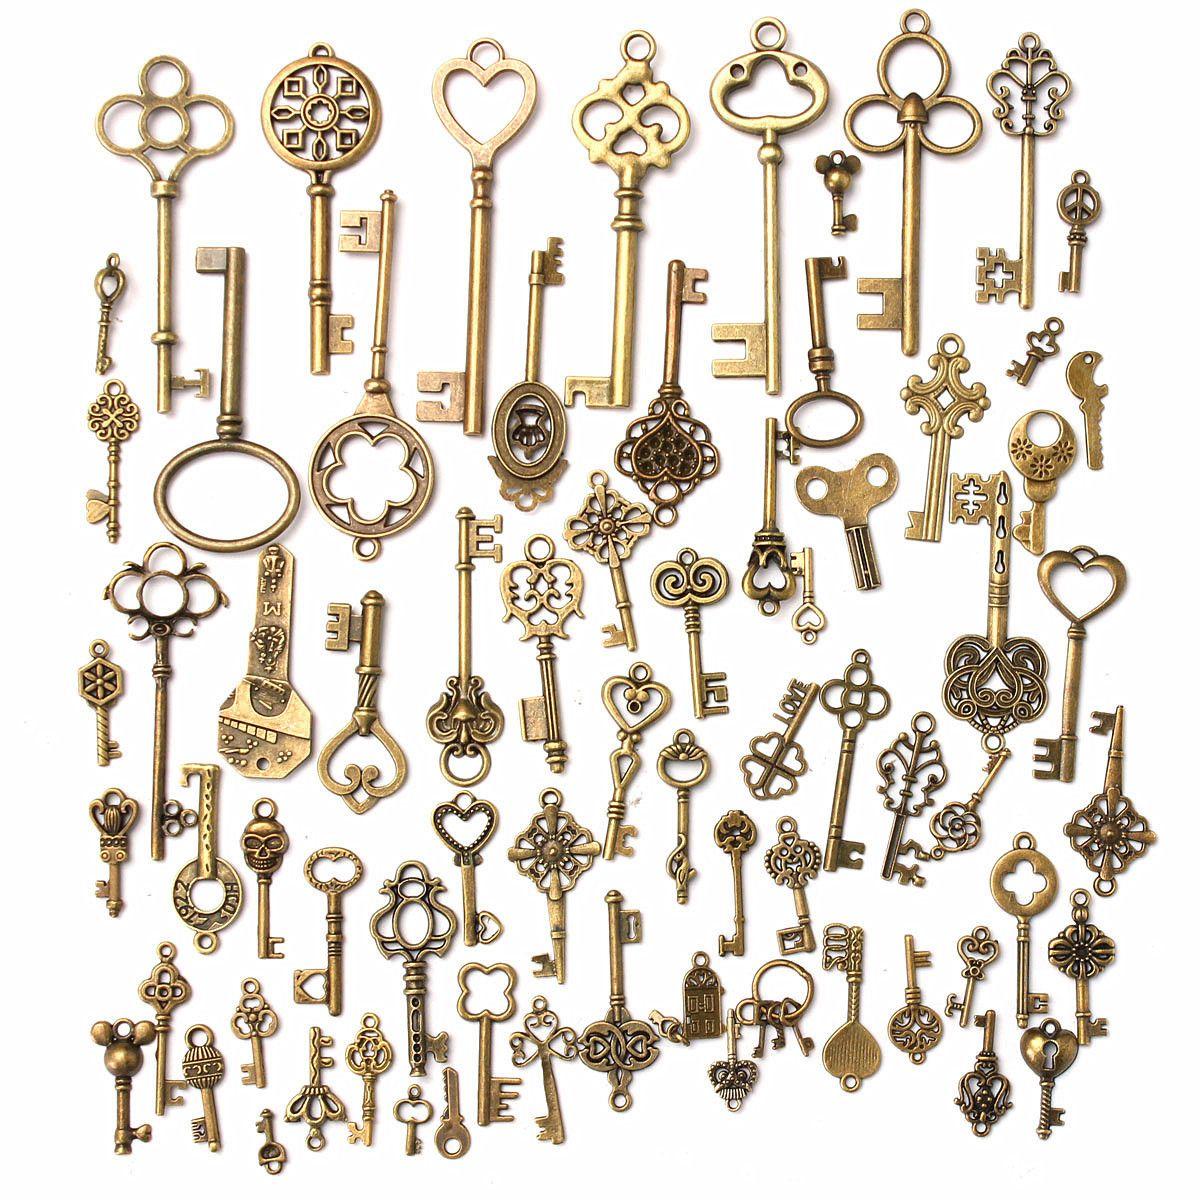 Retro Key DIY Metal Key 70 Mix Creative Jewelry Accessories Popular Jewelry Decorative Zippers Decor Gifts Support FBA Drop Shipping G993F